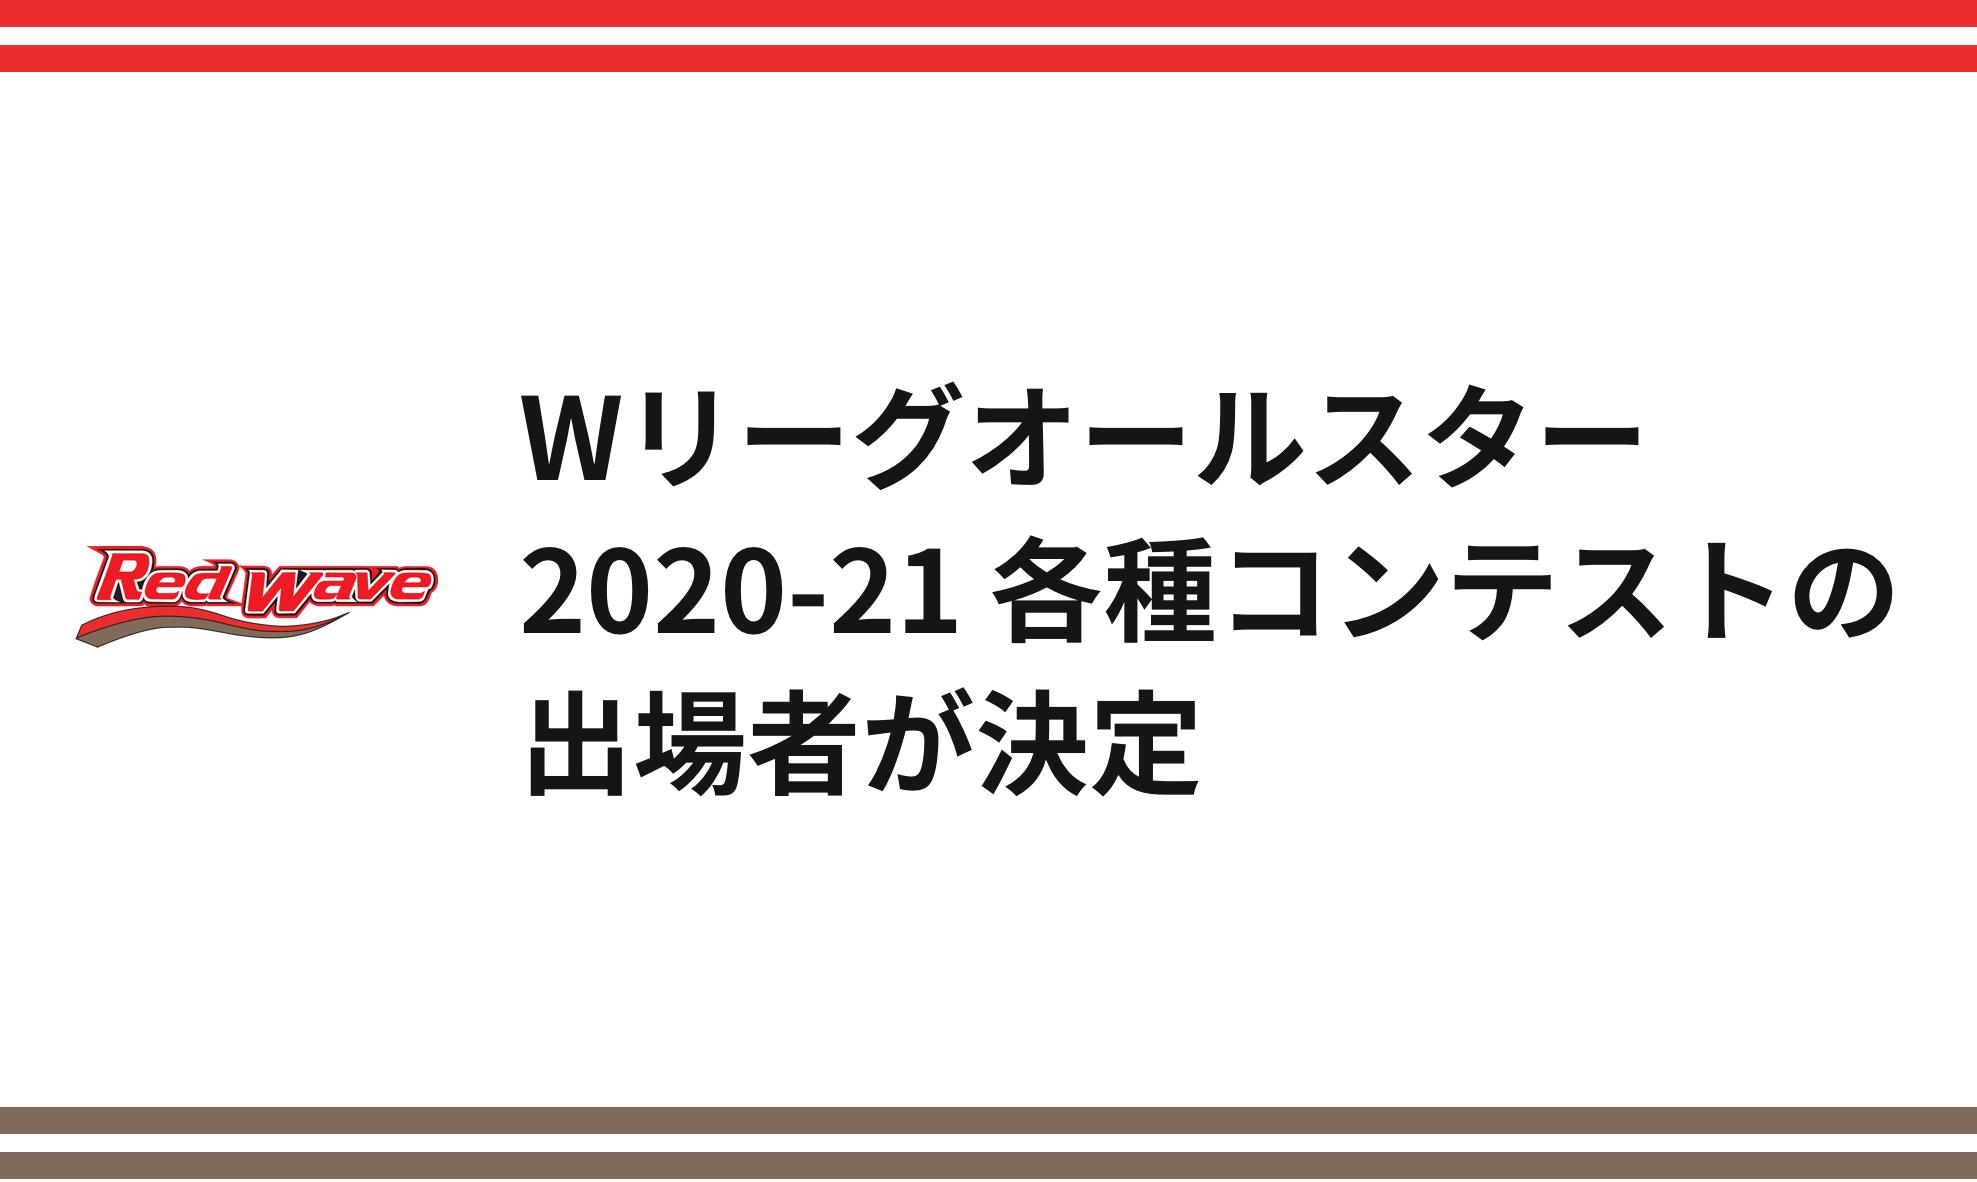 Wリーグオールスター 2020-21 各種…